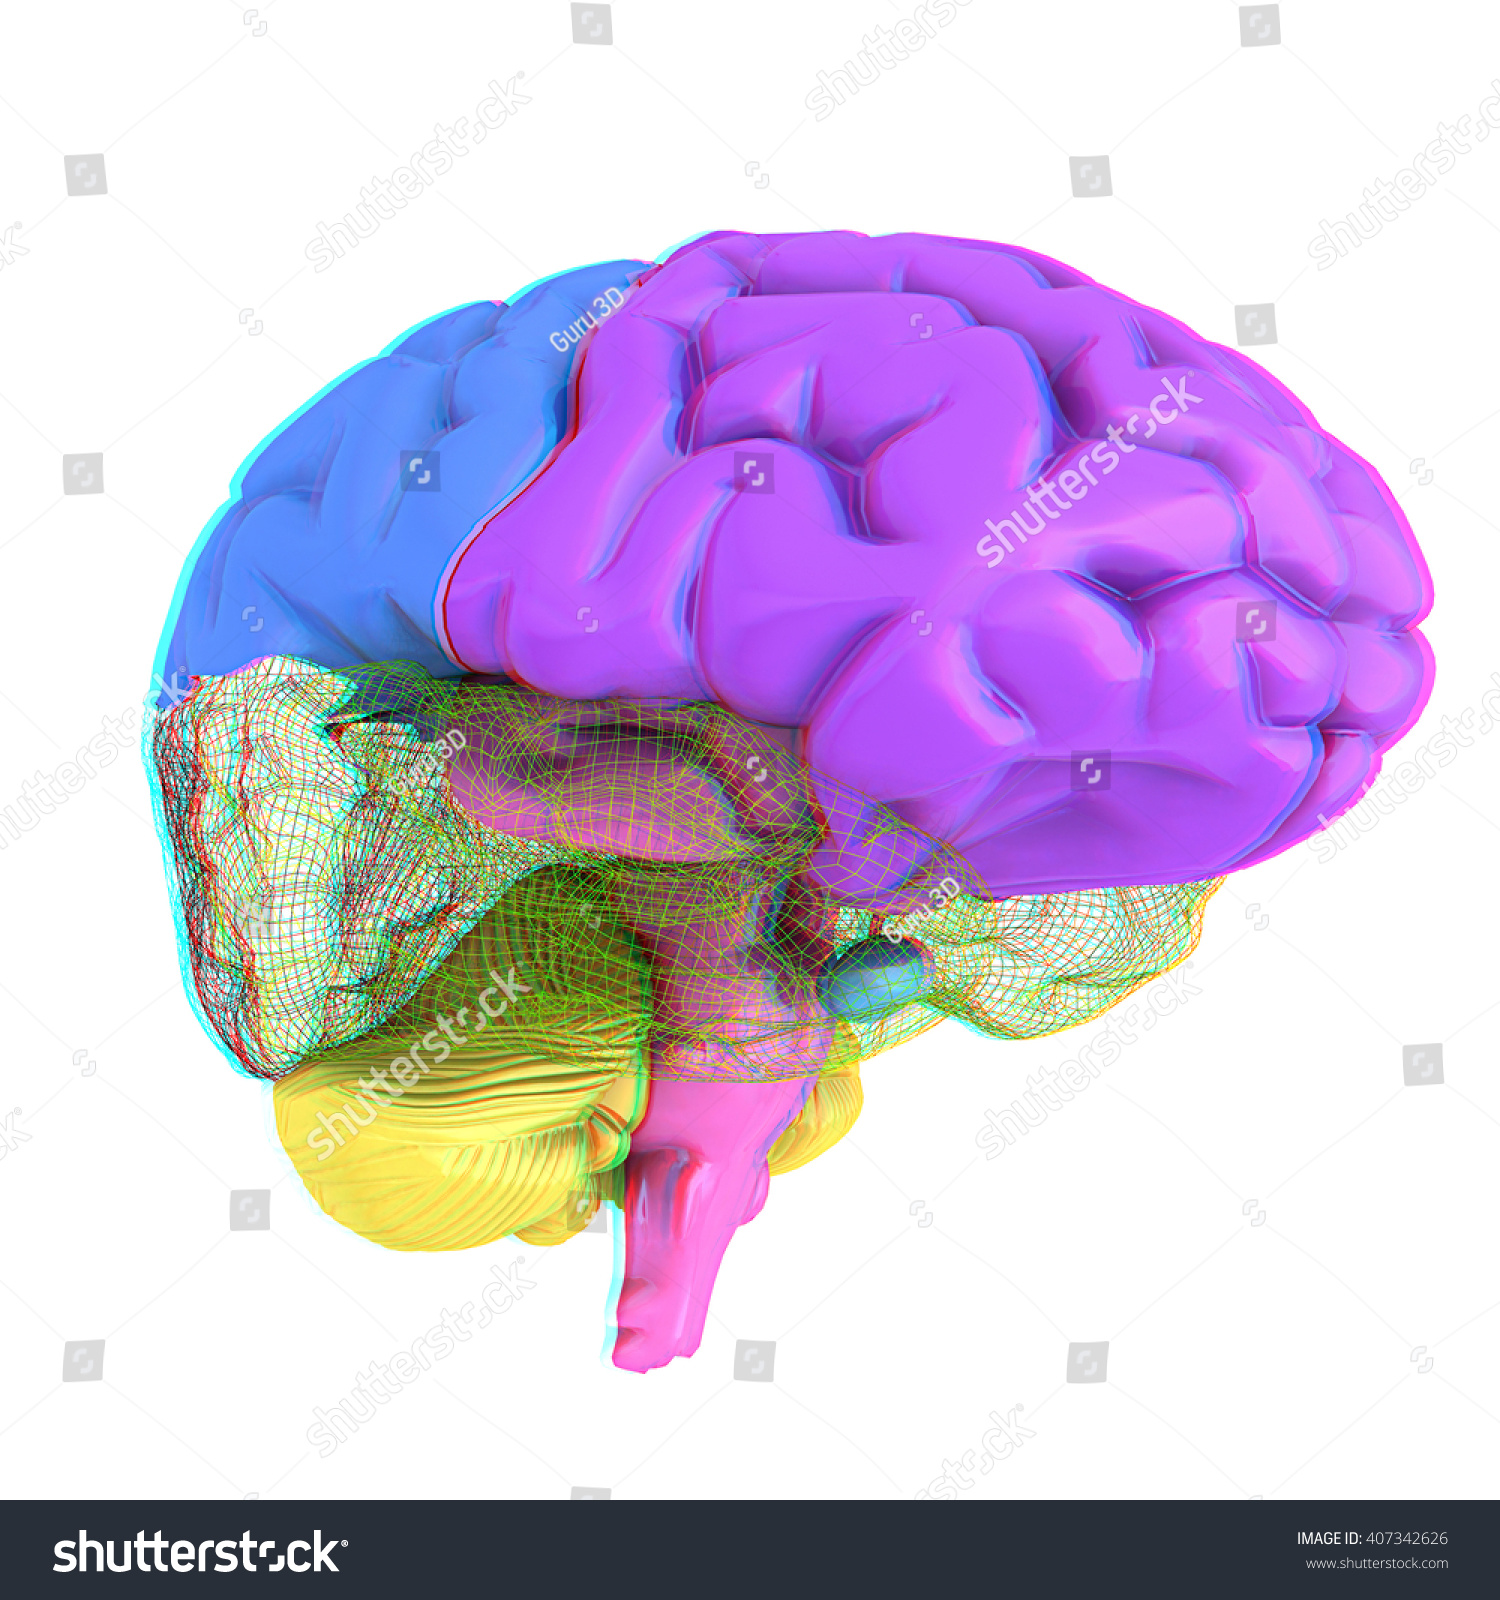 Creative concept of the human brain   EZ Canvas